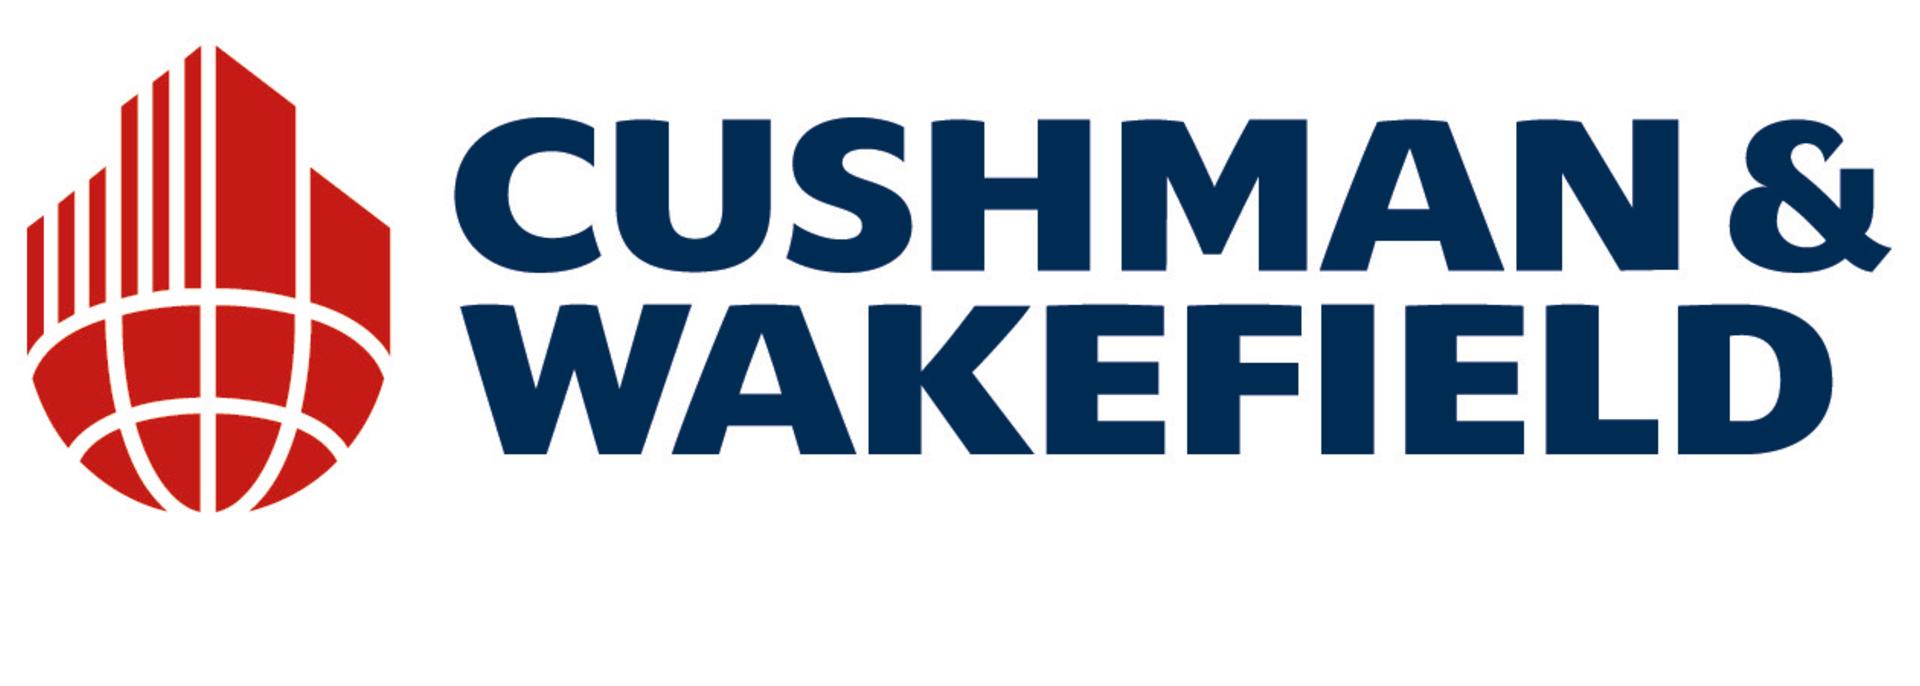 Cushman & Wakefield.